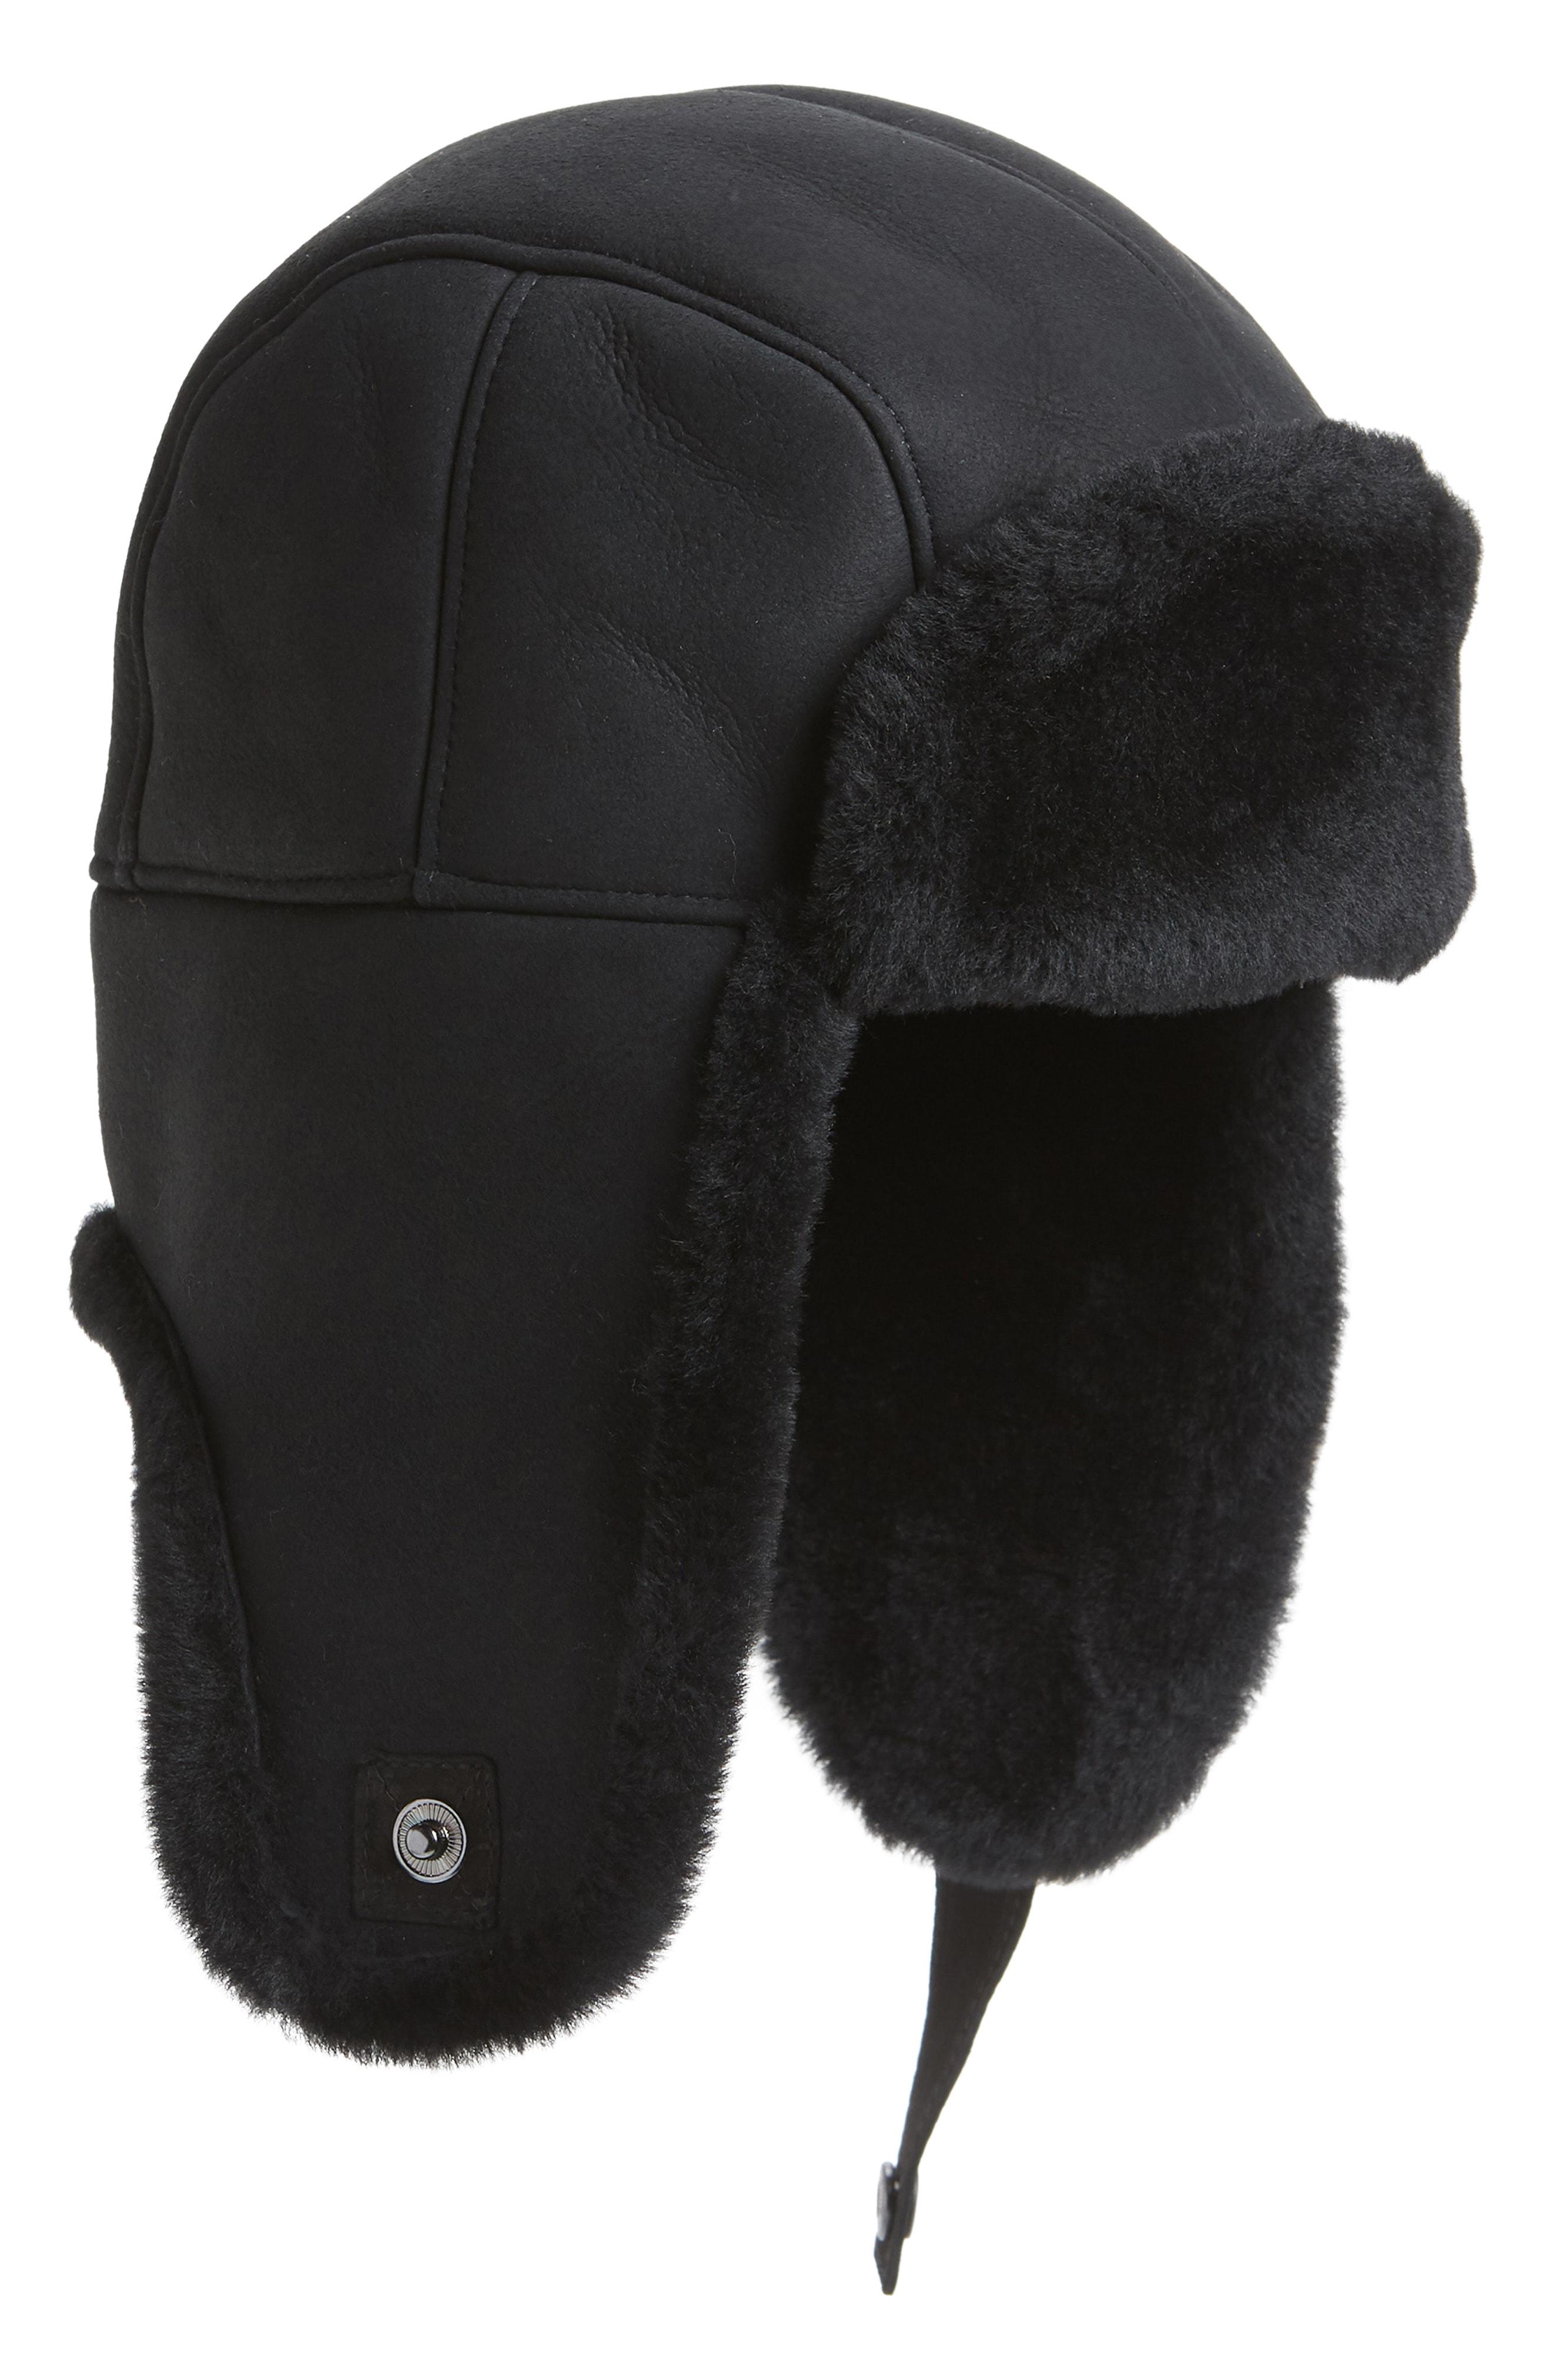 6bd0e06f49bc3 Ugg Men s Shearling-Lined Sheepskin Trapper Hat In Black